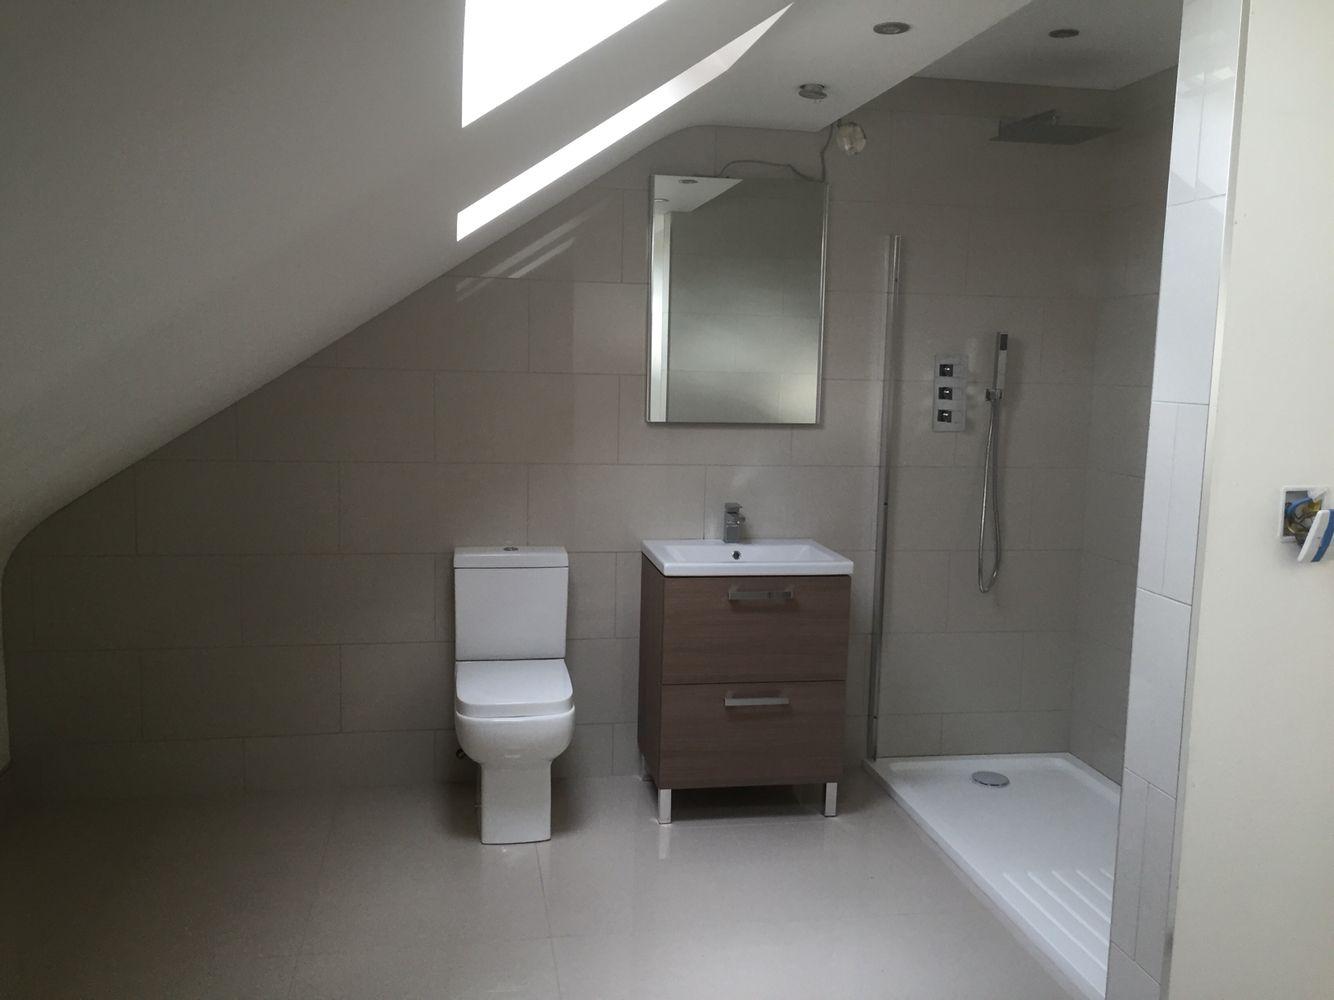 Ensuite Bathroom In Victorian House loft room ensuite. topps tiles: regal vanilla polished. walk in